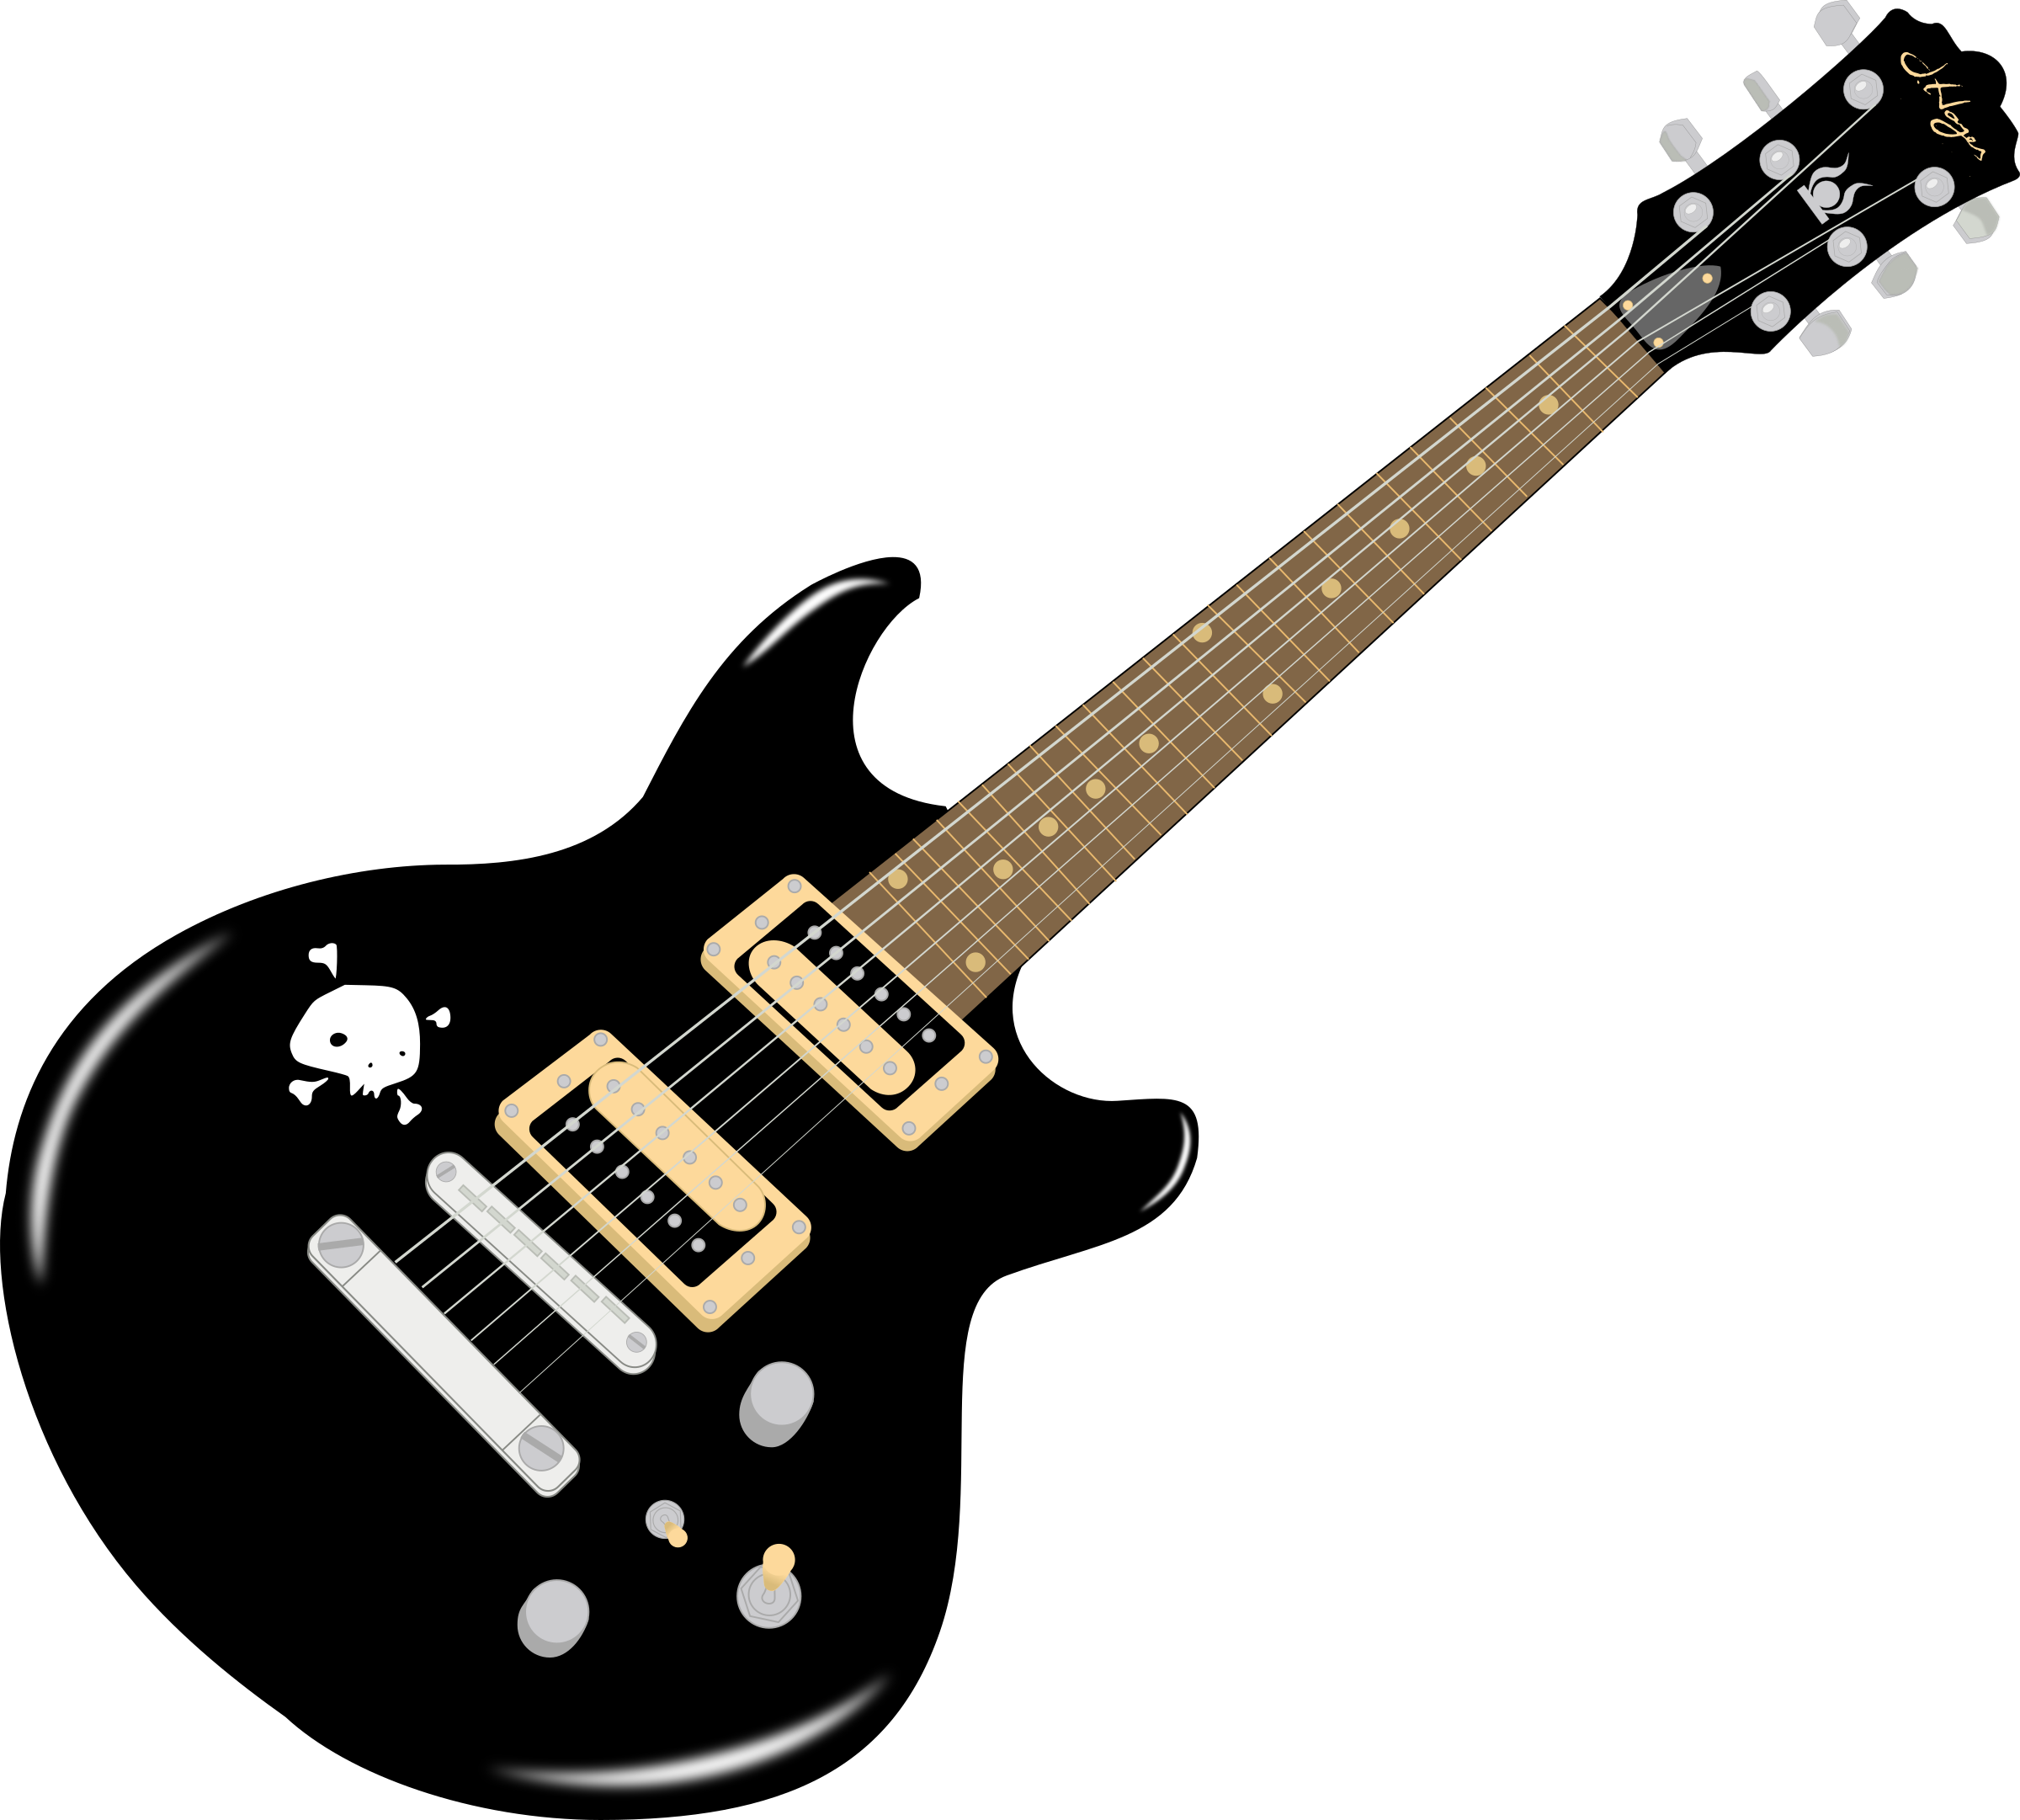 Picture clipart guitar. Png transparent images image